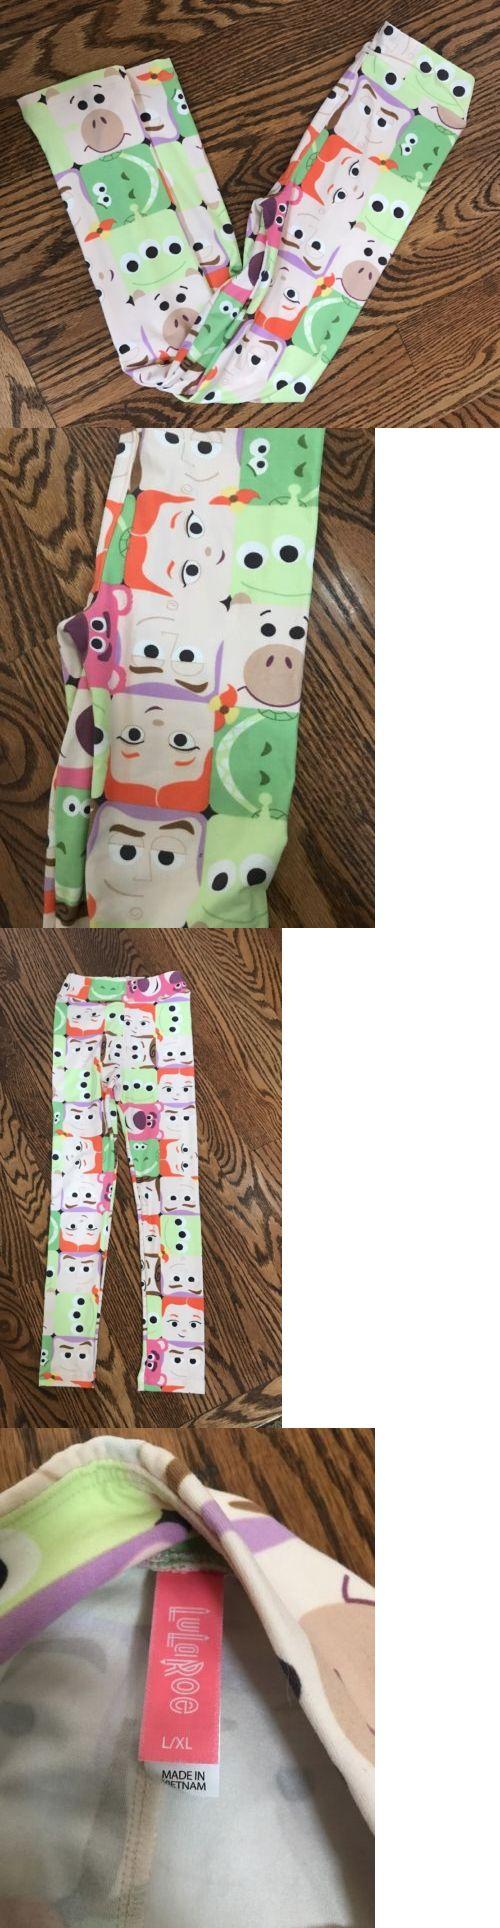 Pants 175654: New Lularoe Disney Toy Story Rex, Woody, Jessie Leggings Kids Large Xl L Xl -> BUY IT NOW ONLY: $39.99 on eBay!